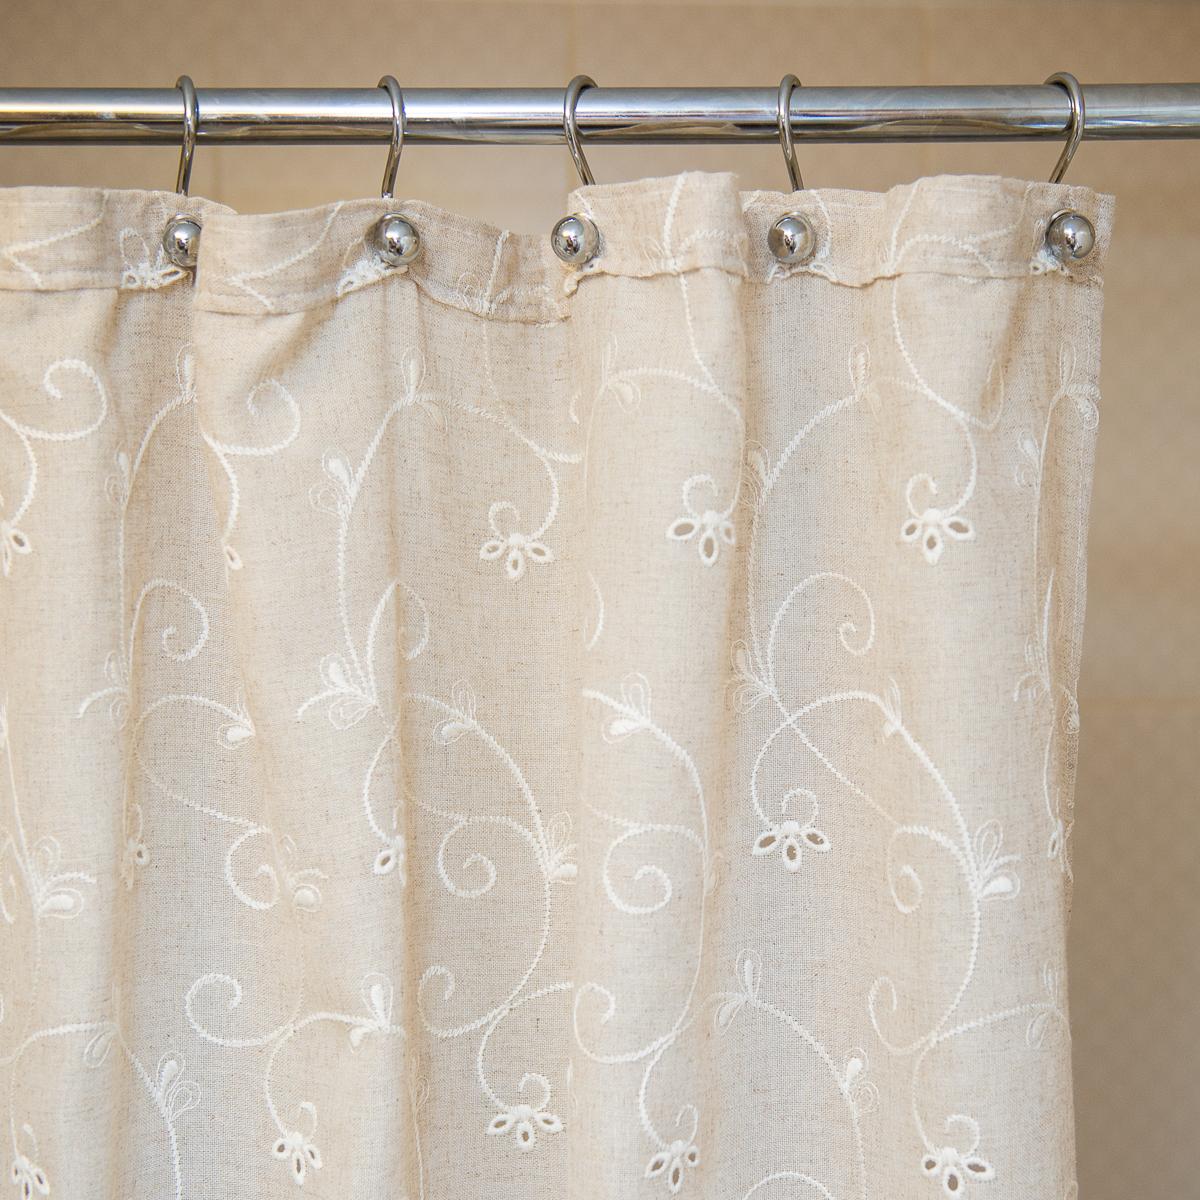 Шторки для ванной Шторка для ванной 180х200 Arti-Deco Embroidery 2803 Mix elitnaya-shtorka-dlya-vannoy-180h200-embroidery-2803-mix-от-arti-deco-ispaniya.jpg